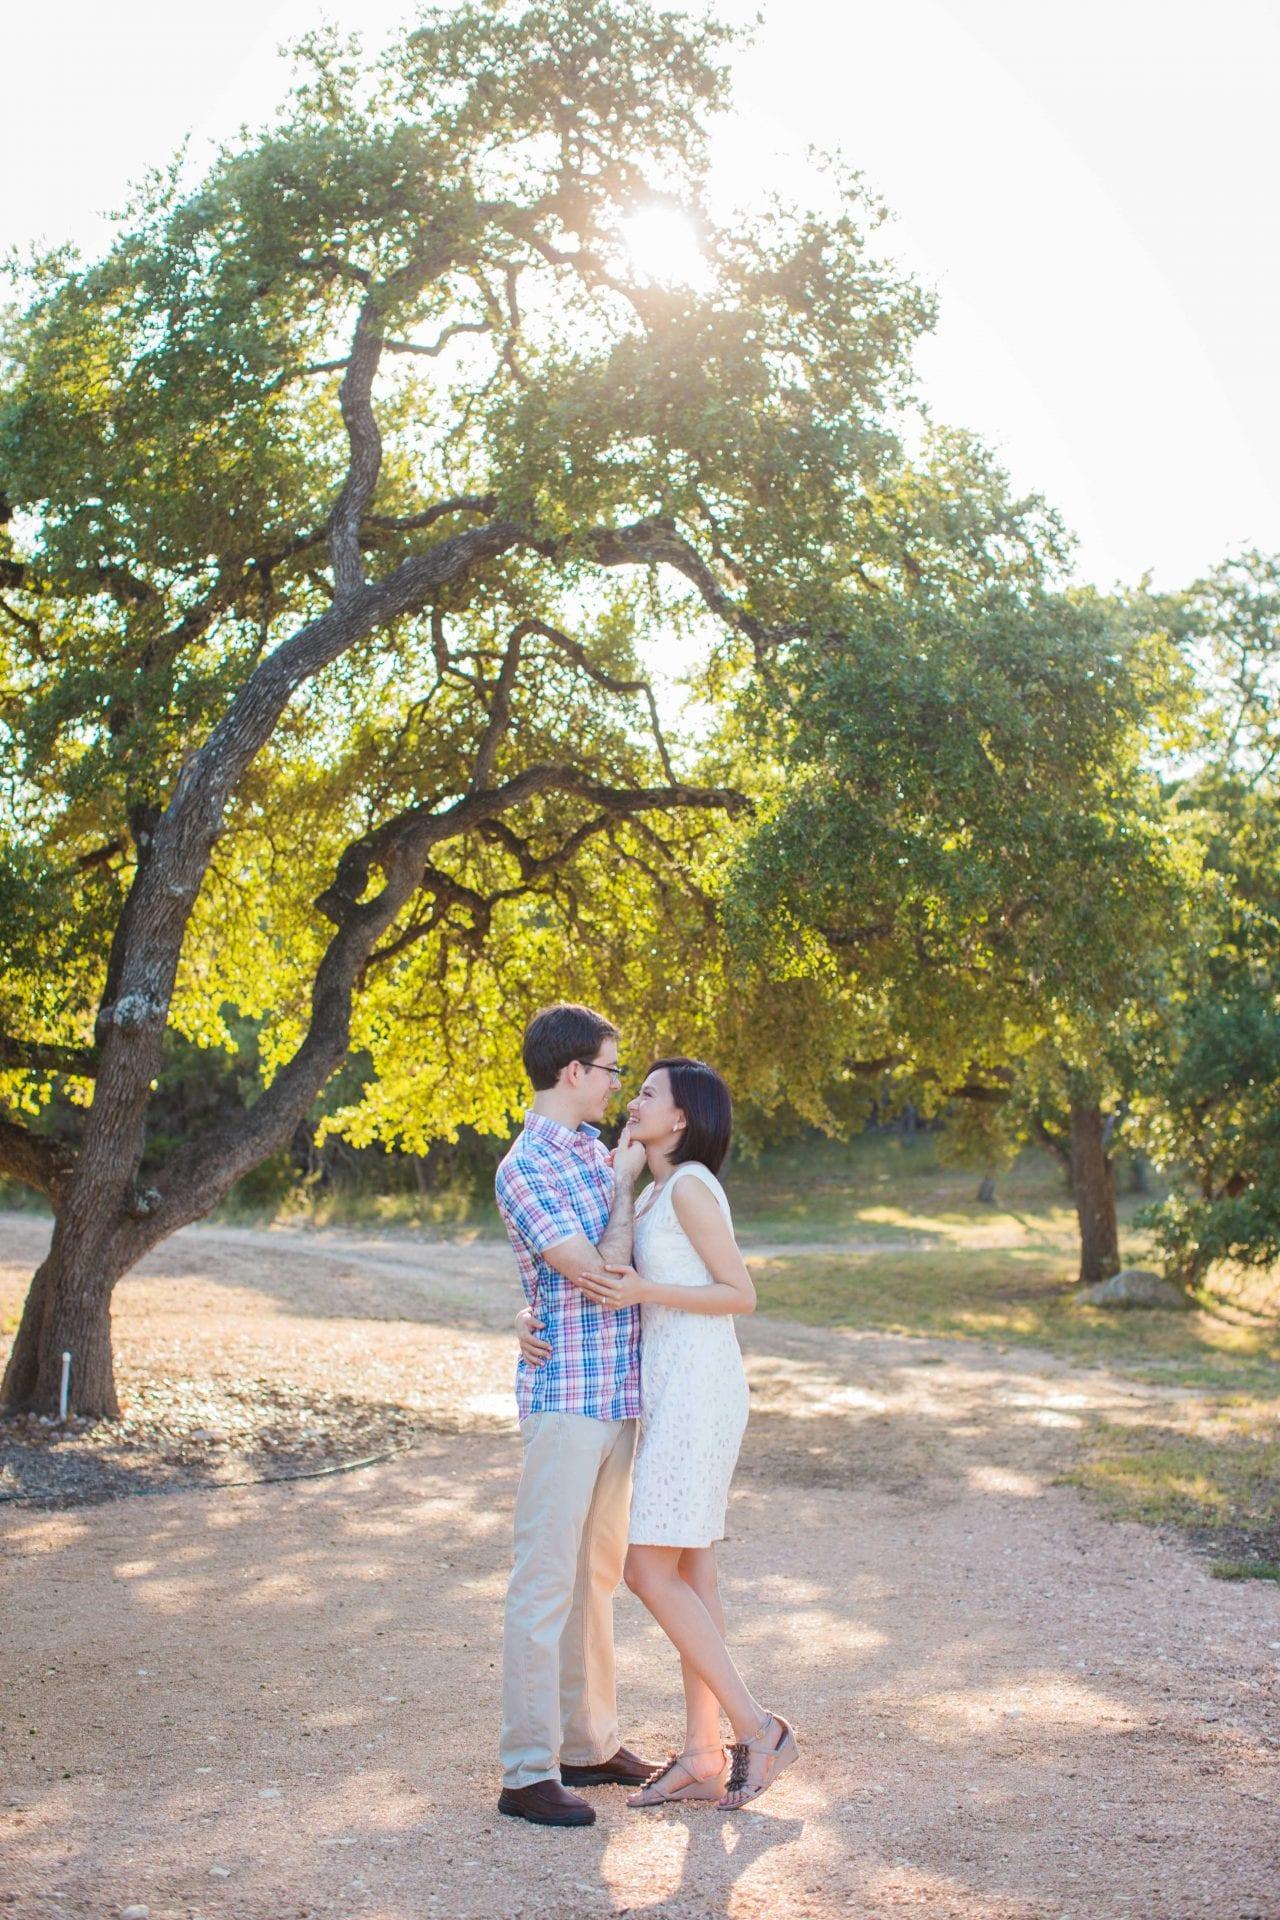 Josh and Tina engagement session at Kendall plantation hug on path under trees